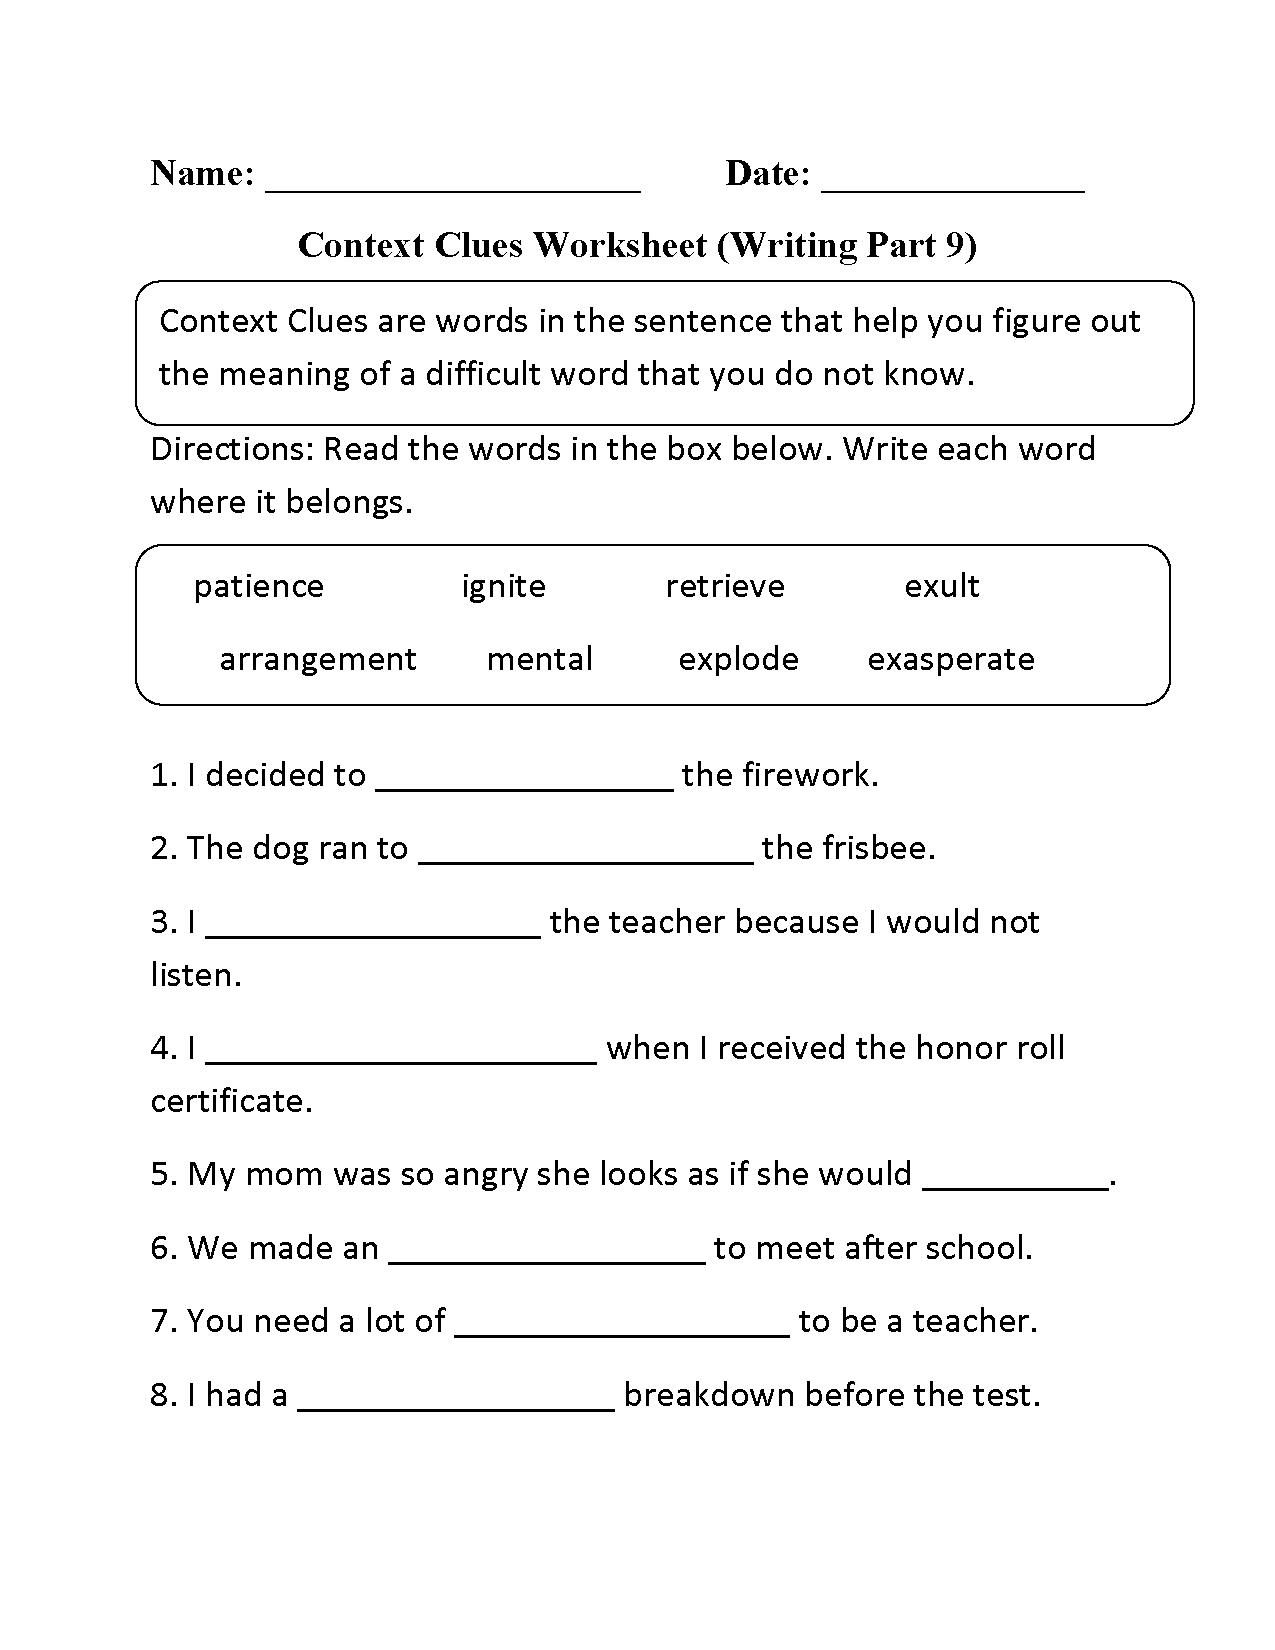 small resolution of Englishlinx.com   Context Clues Worksheets   Context clues worksheets